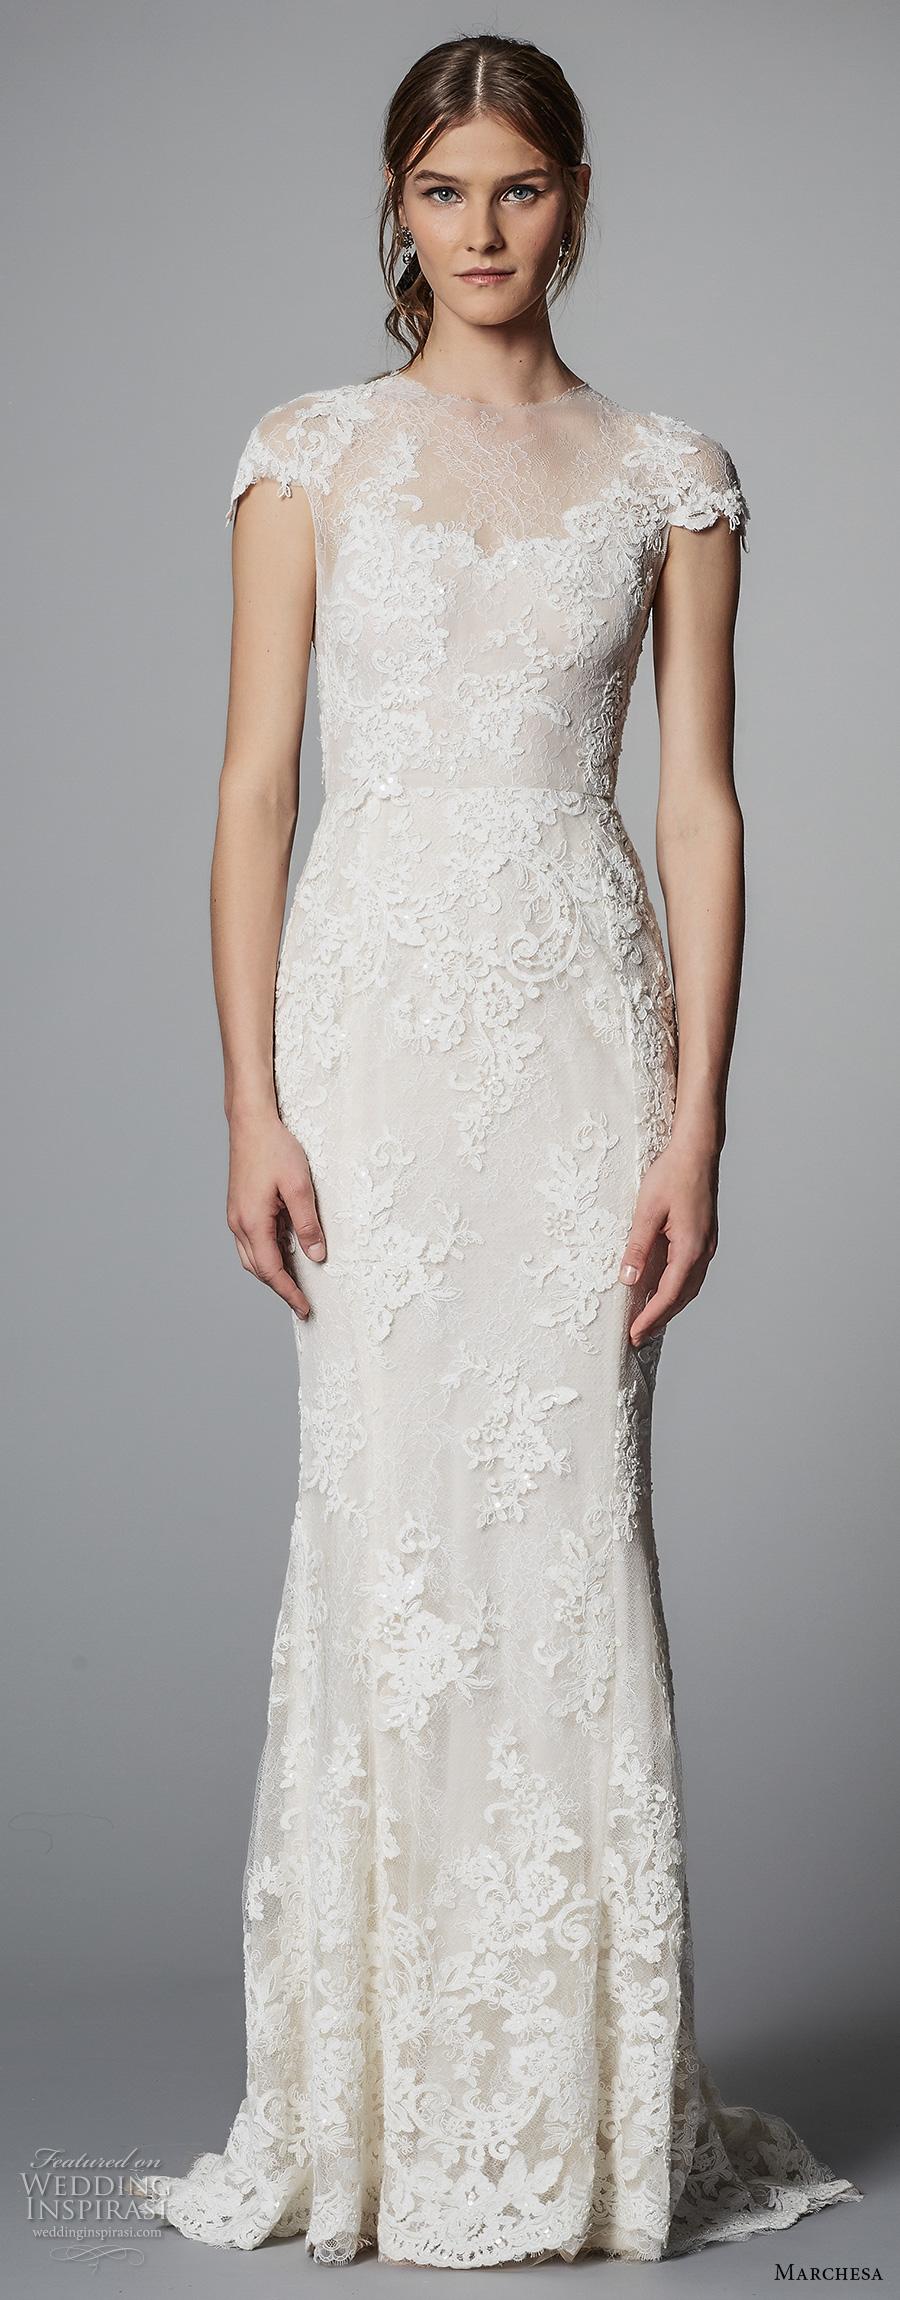 marchesa spring 2018 bridal cap sleeves illusion jewel sweetheart neckline heavily embellished bodice tulle skirt elegant sheath wedding dress sheer lace back sweep train (05) mv zv